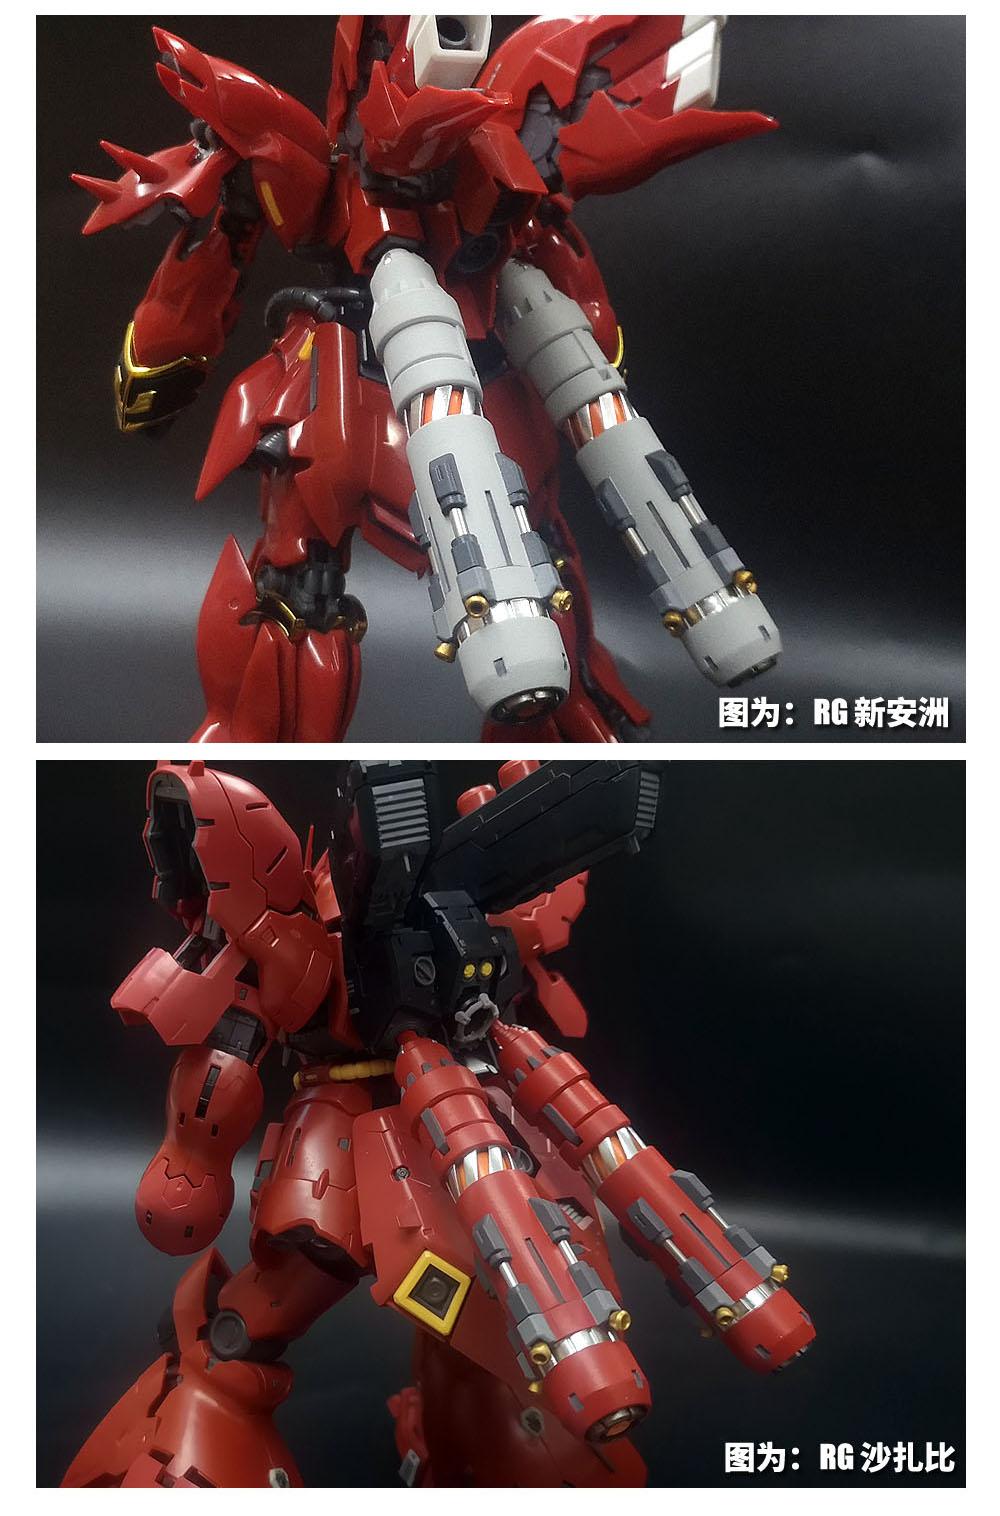 G829_HS018RG_Propeller_tank_007.jpg